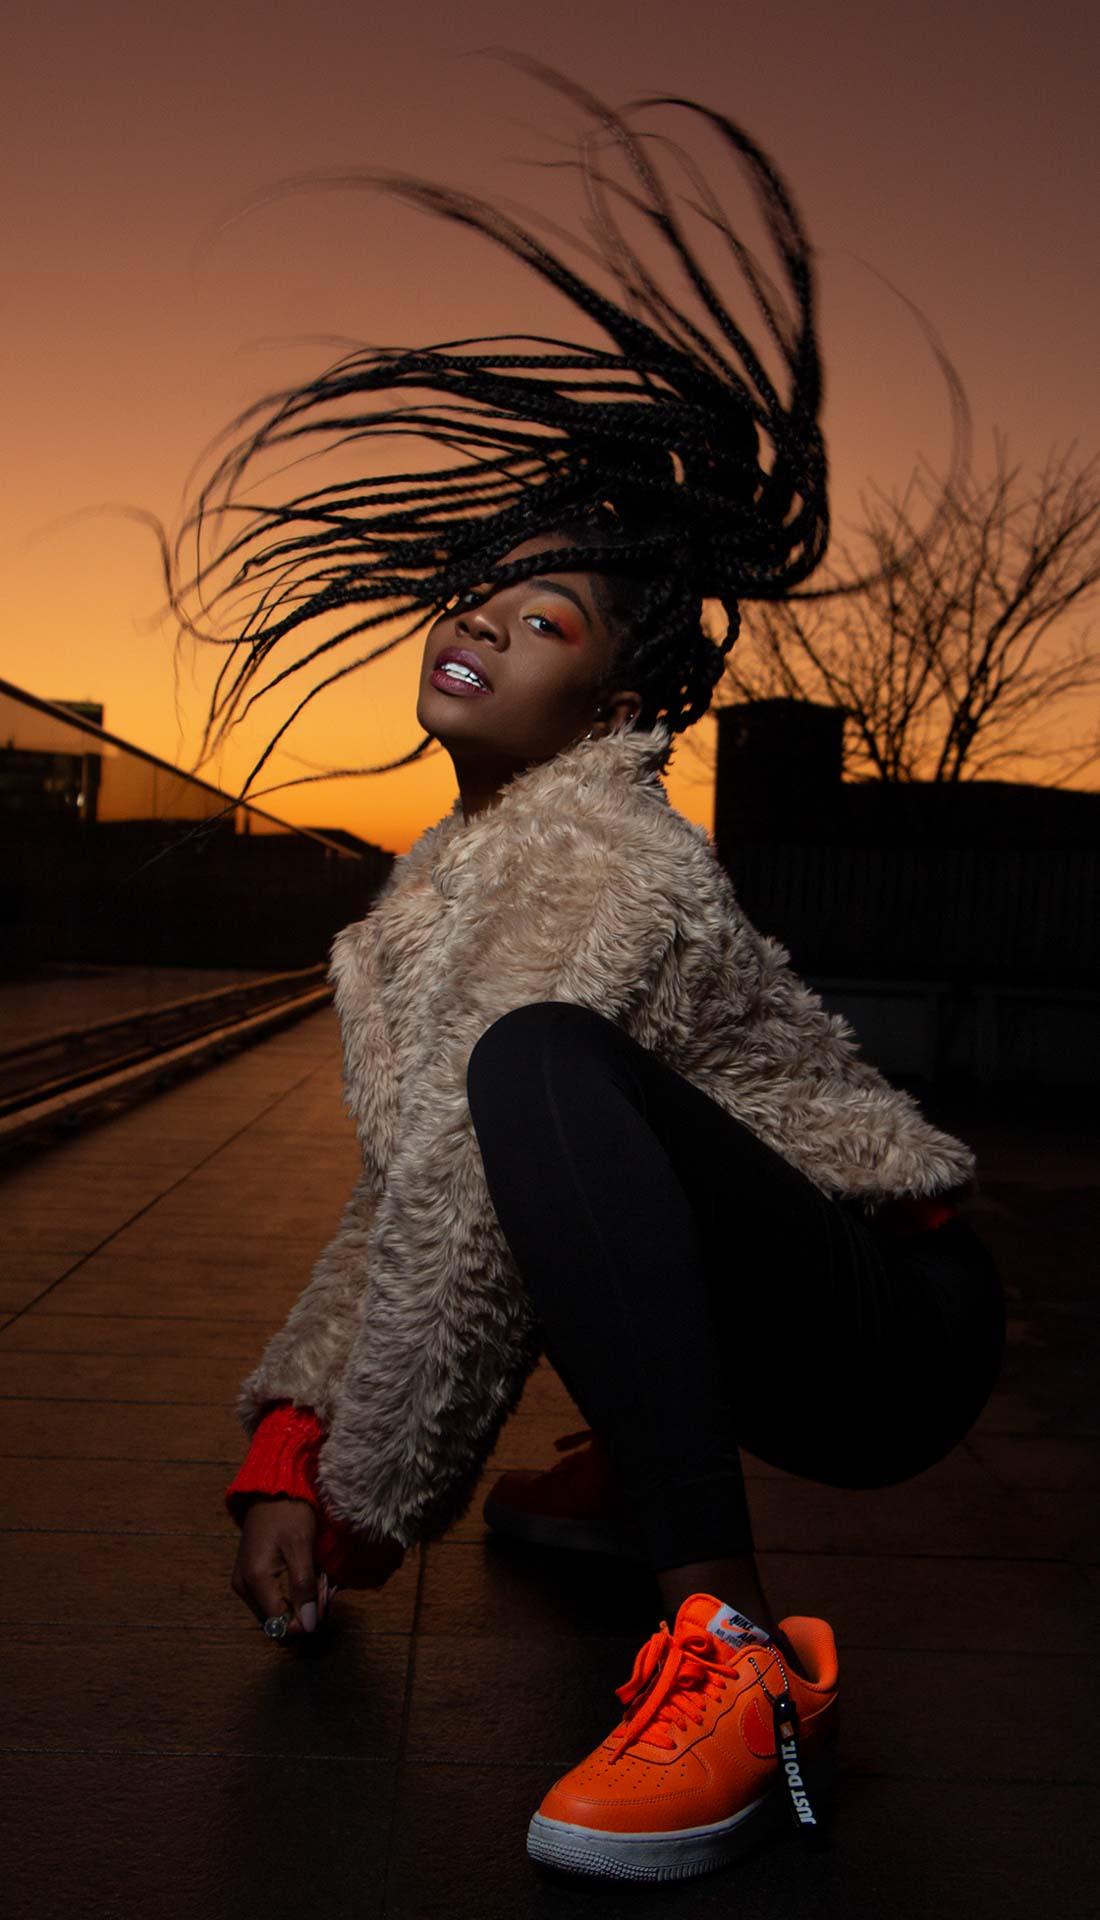 Outdoor fashion photoshoot in Birmingham UK, Nike SB orange shoes, hair flick dance pose, dance photography Birmingham, Fashion photography Birmingham and West Midlands